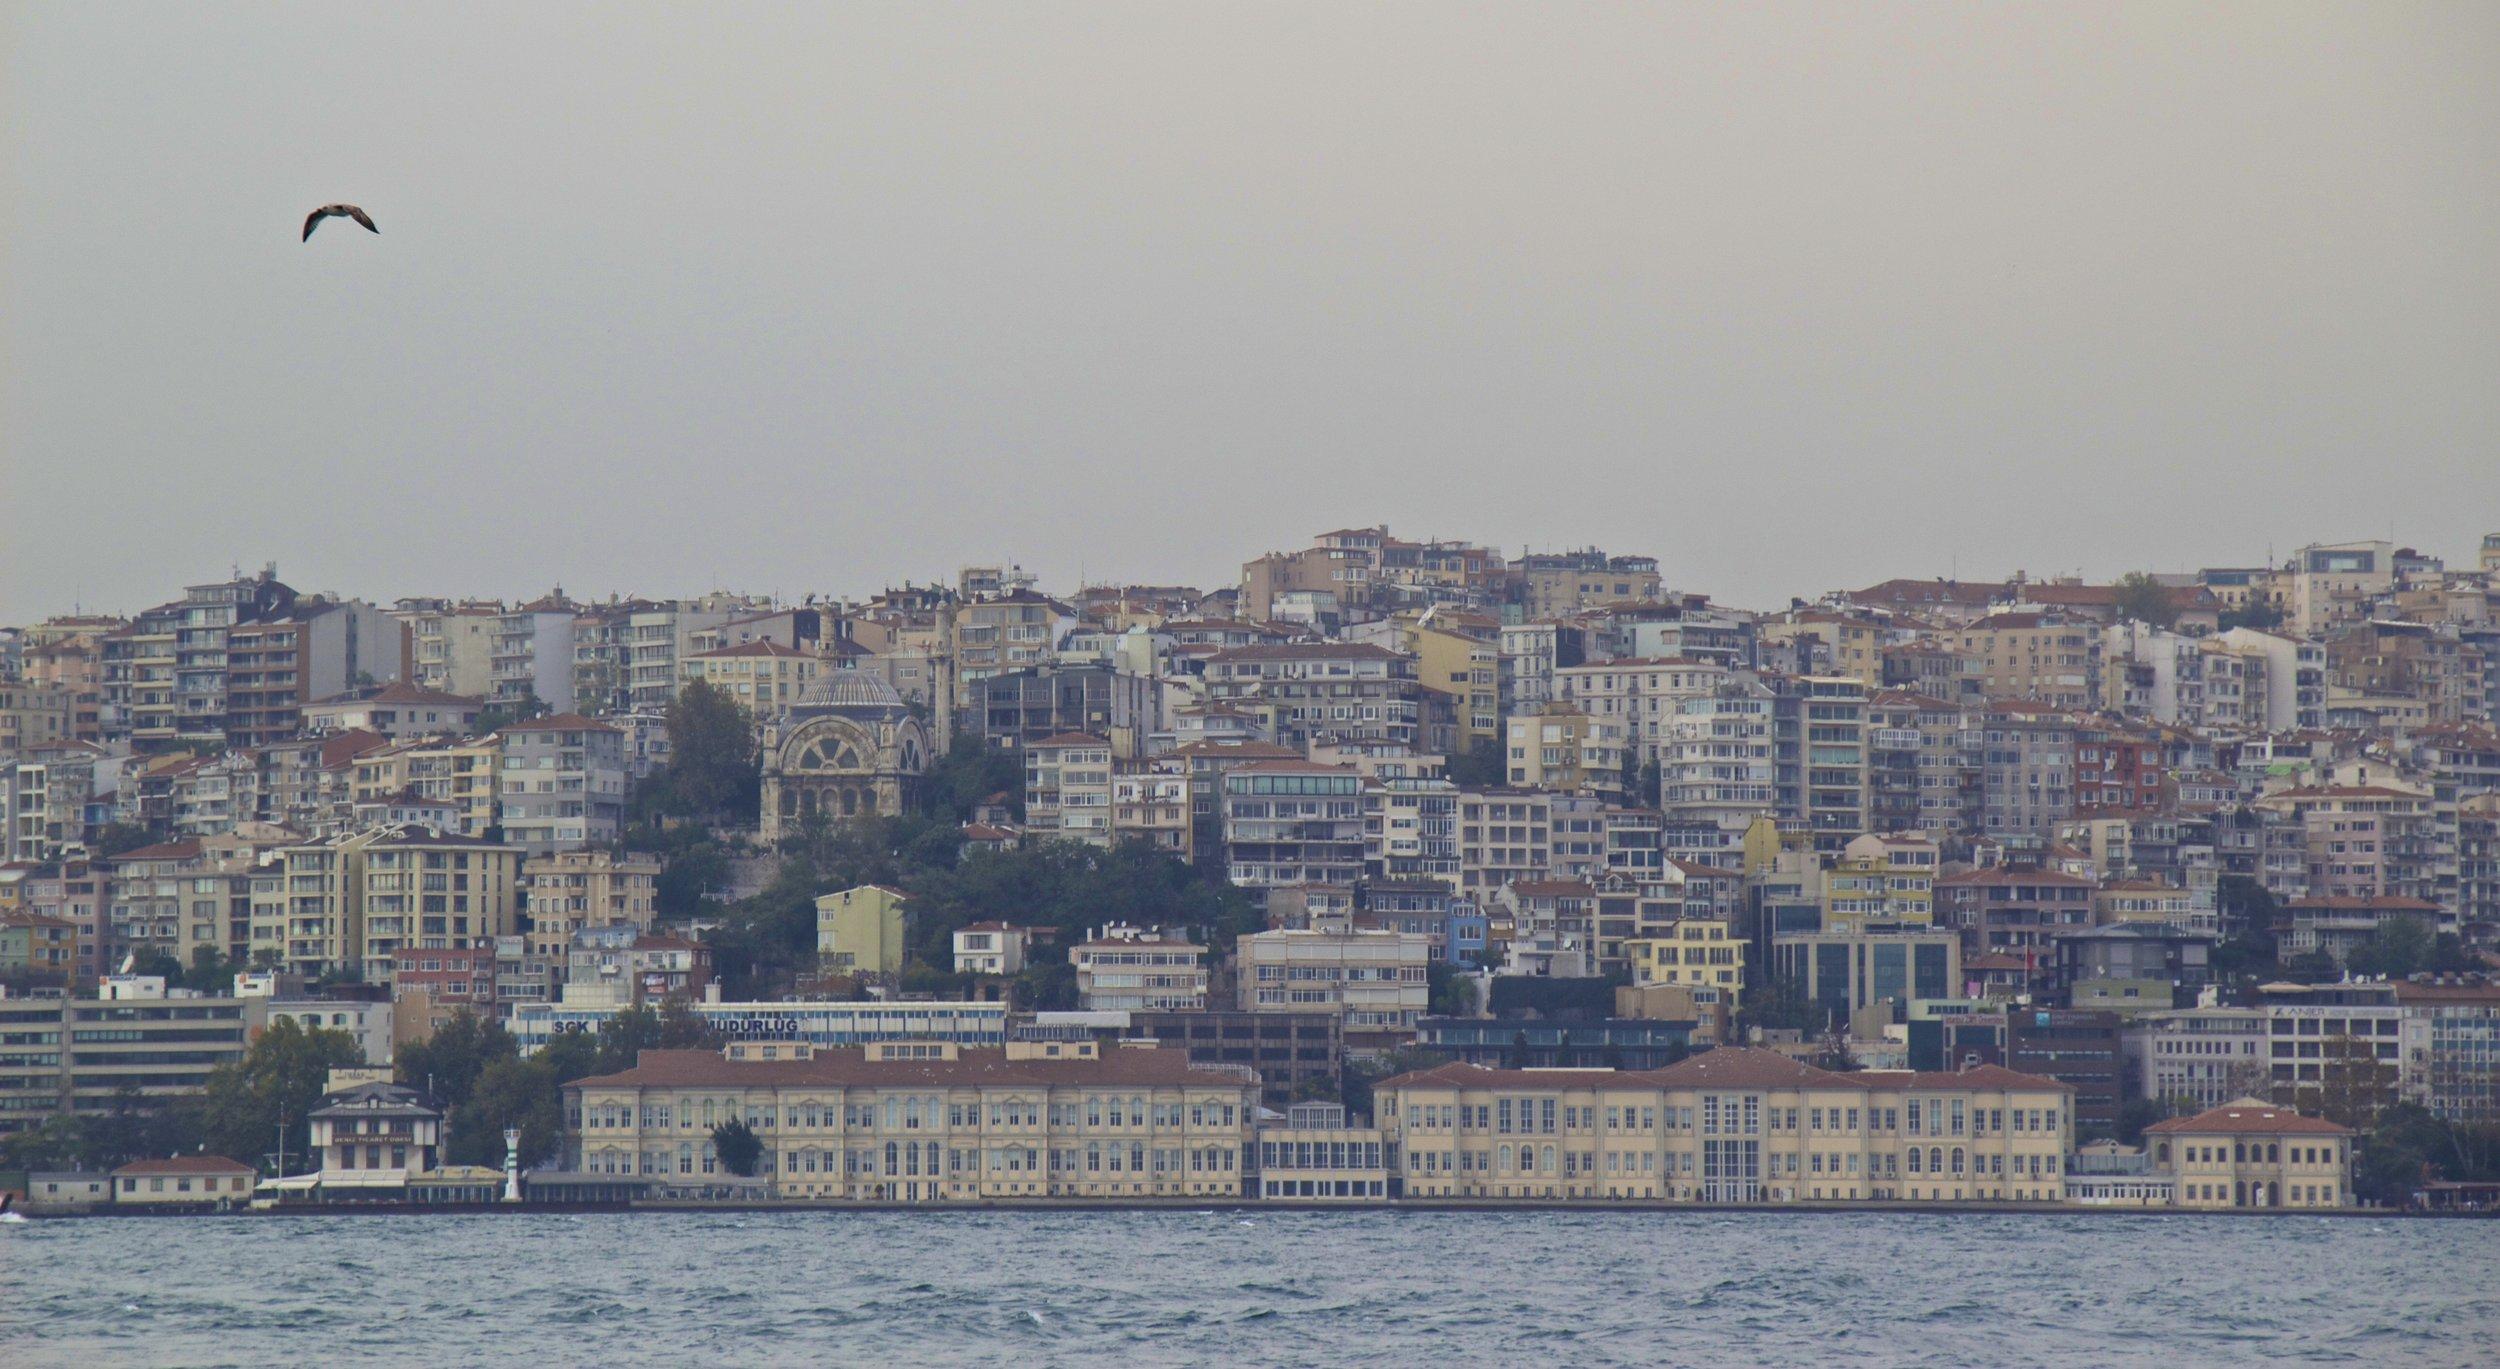 bosphorus istanbul turkey 5.jpg